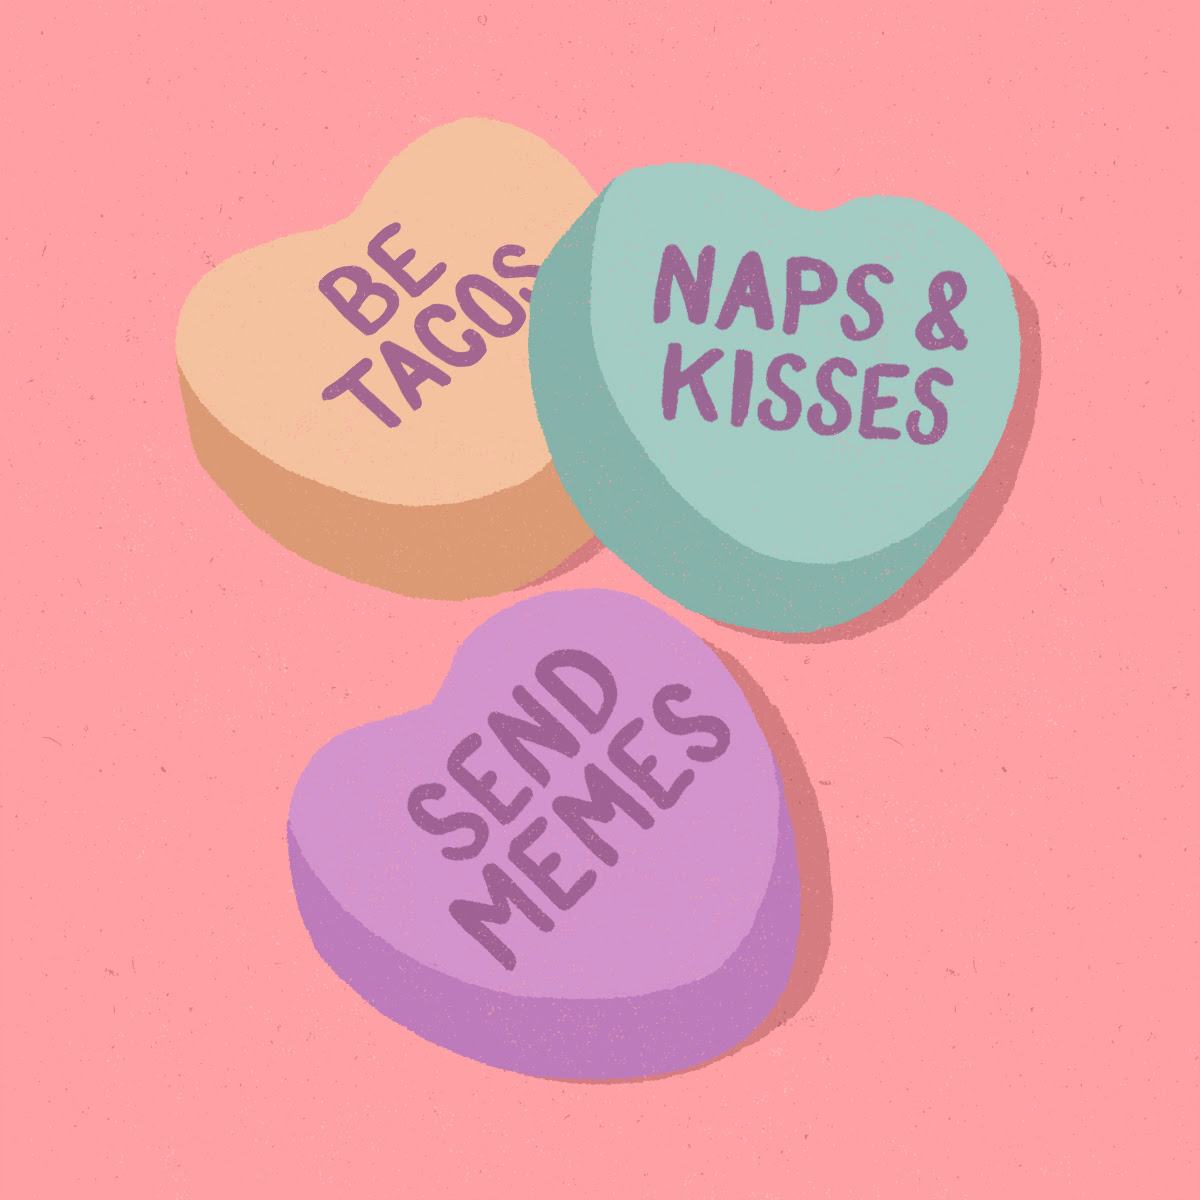 week 4 - Hugs + kisses VS. memes & tacosGuest assignment by Josh Ryan